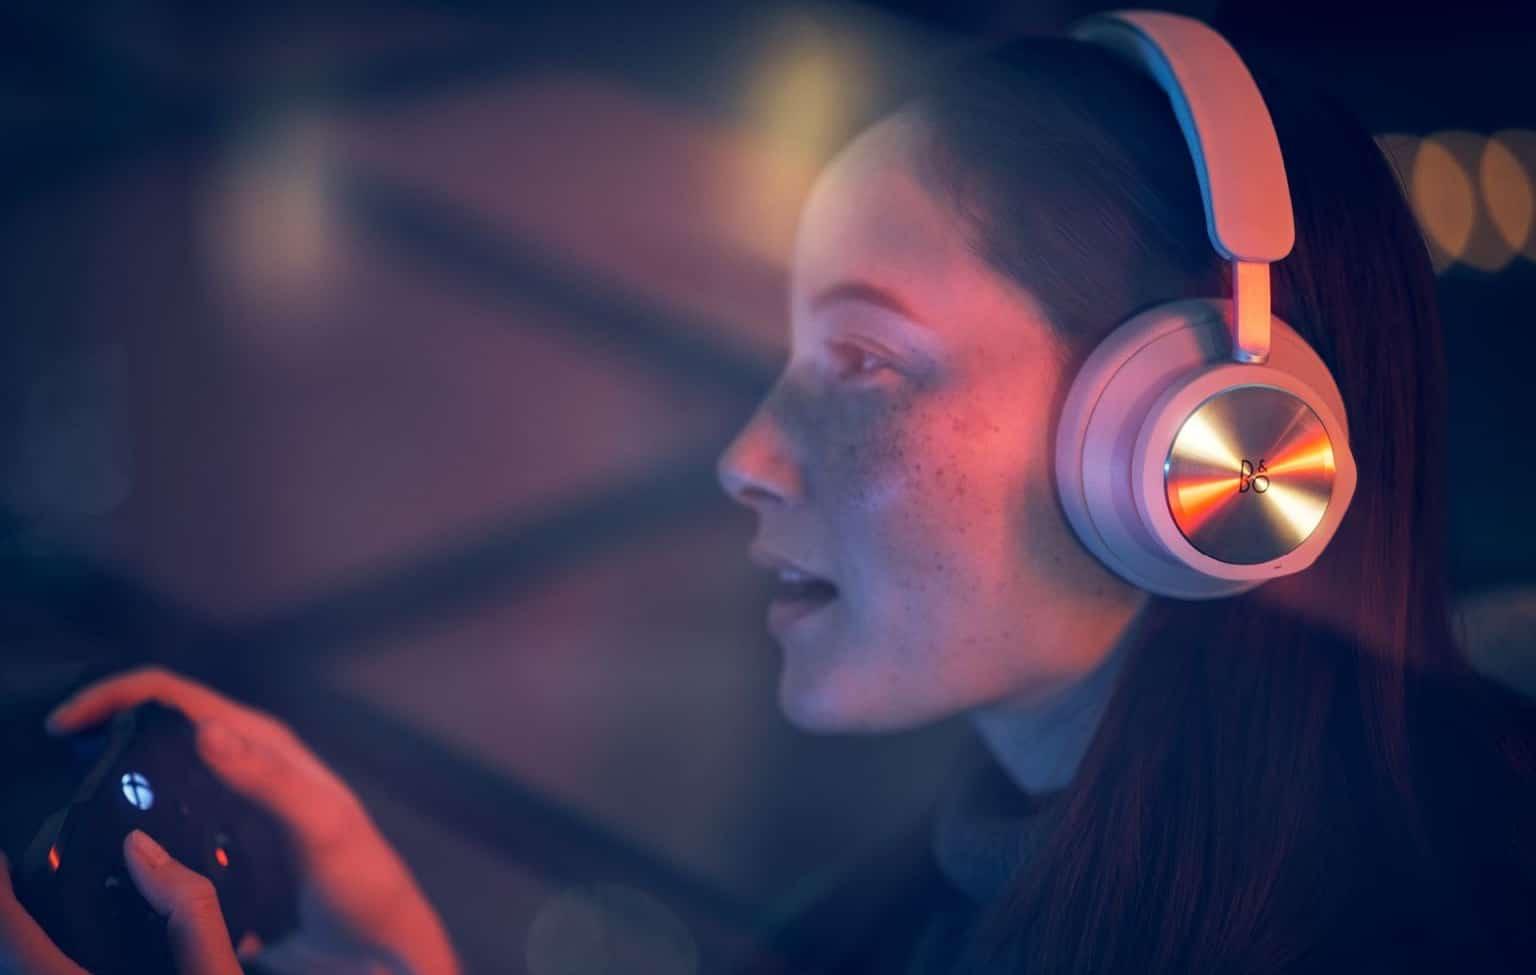 Bang Olufsen Beoplay Portal For Xbox Headphones